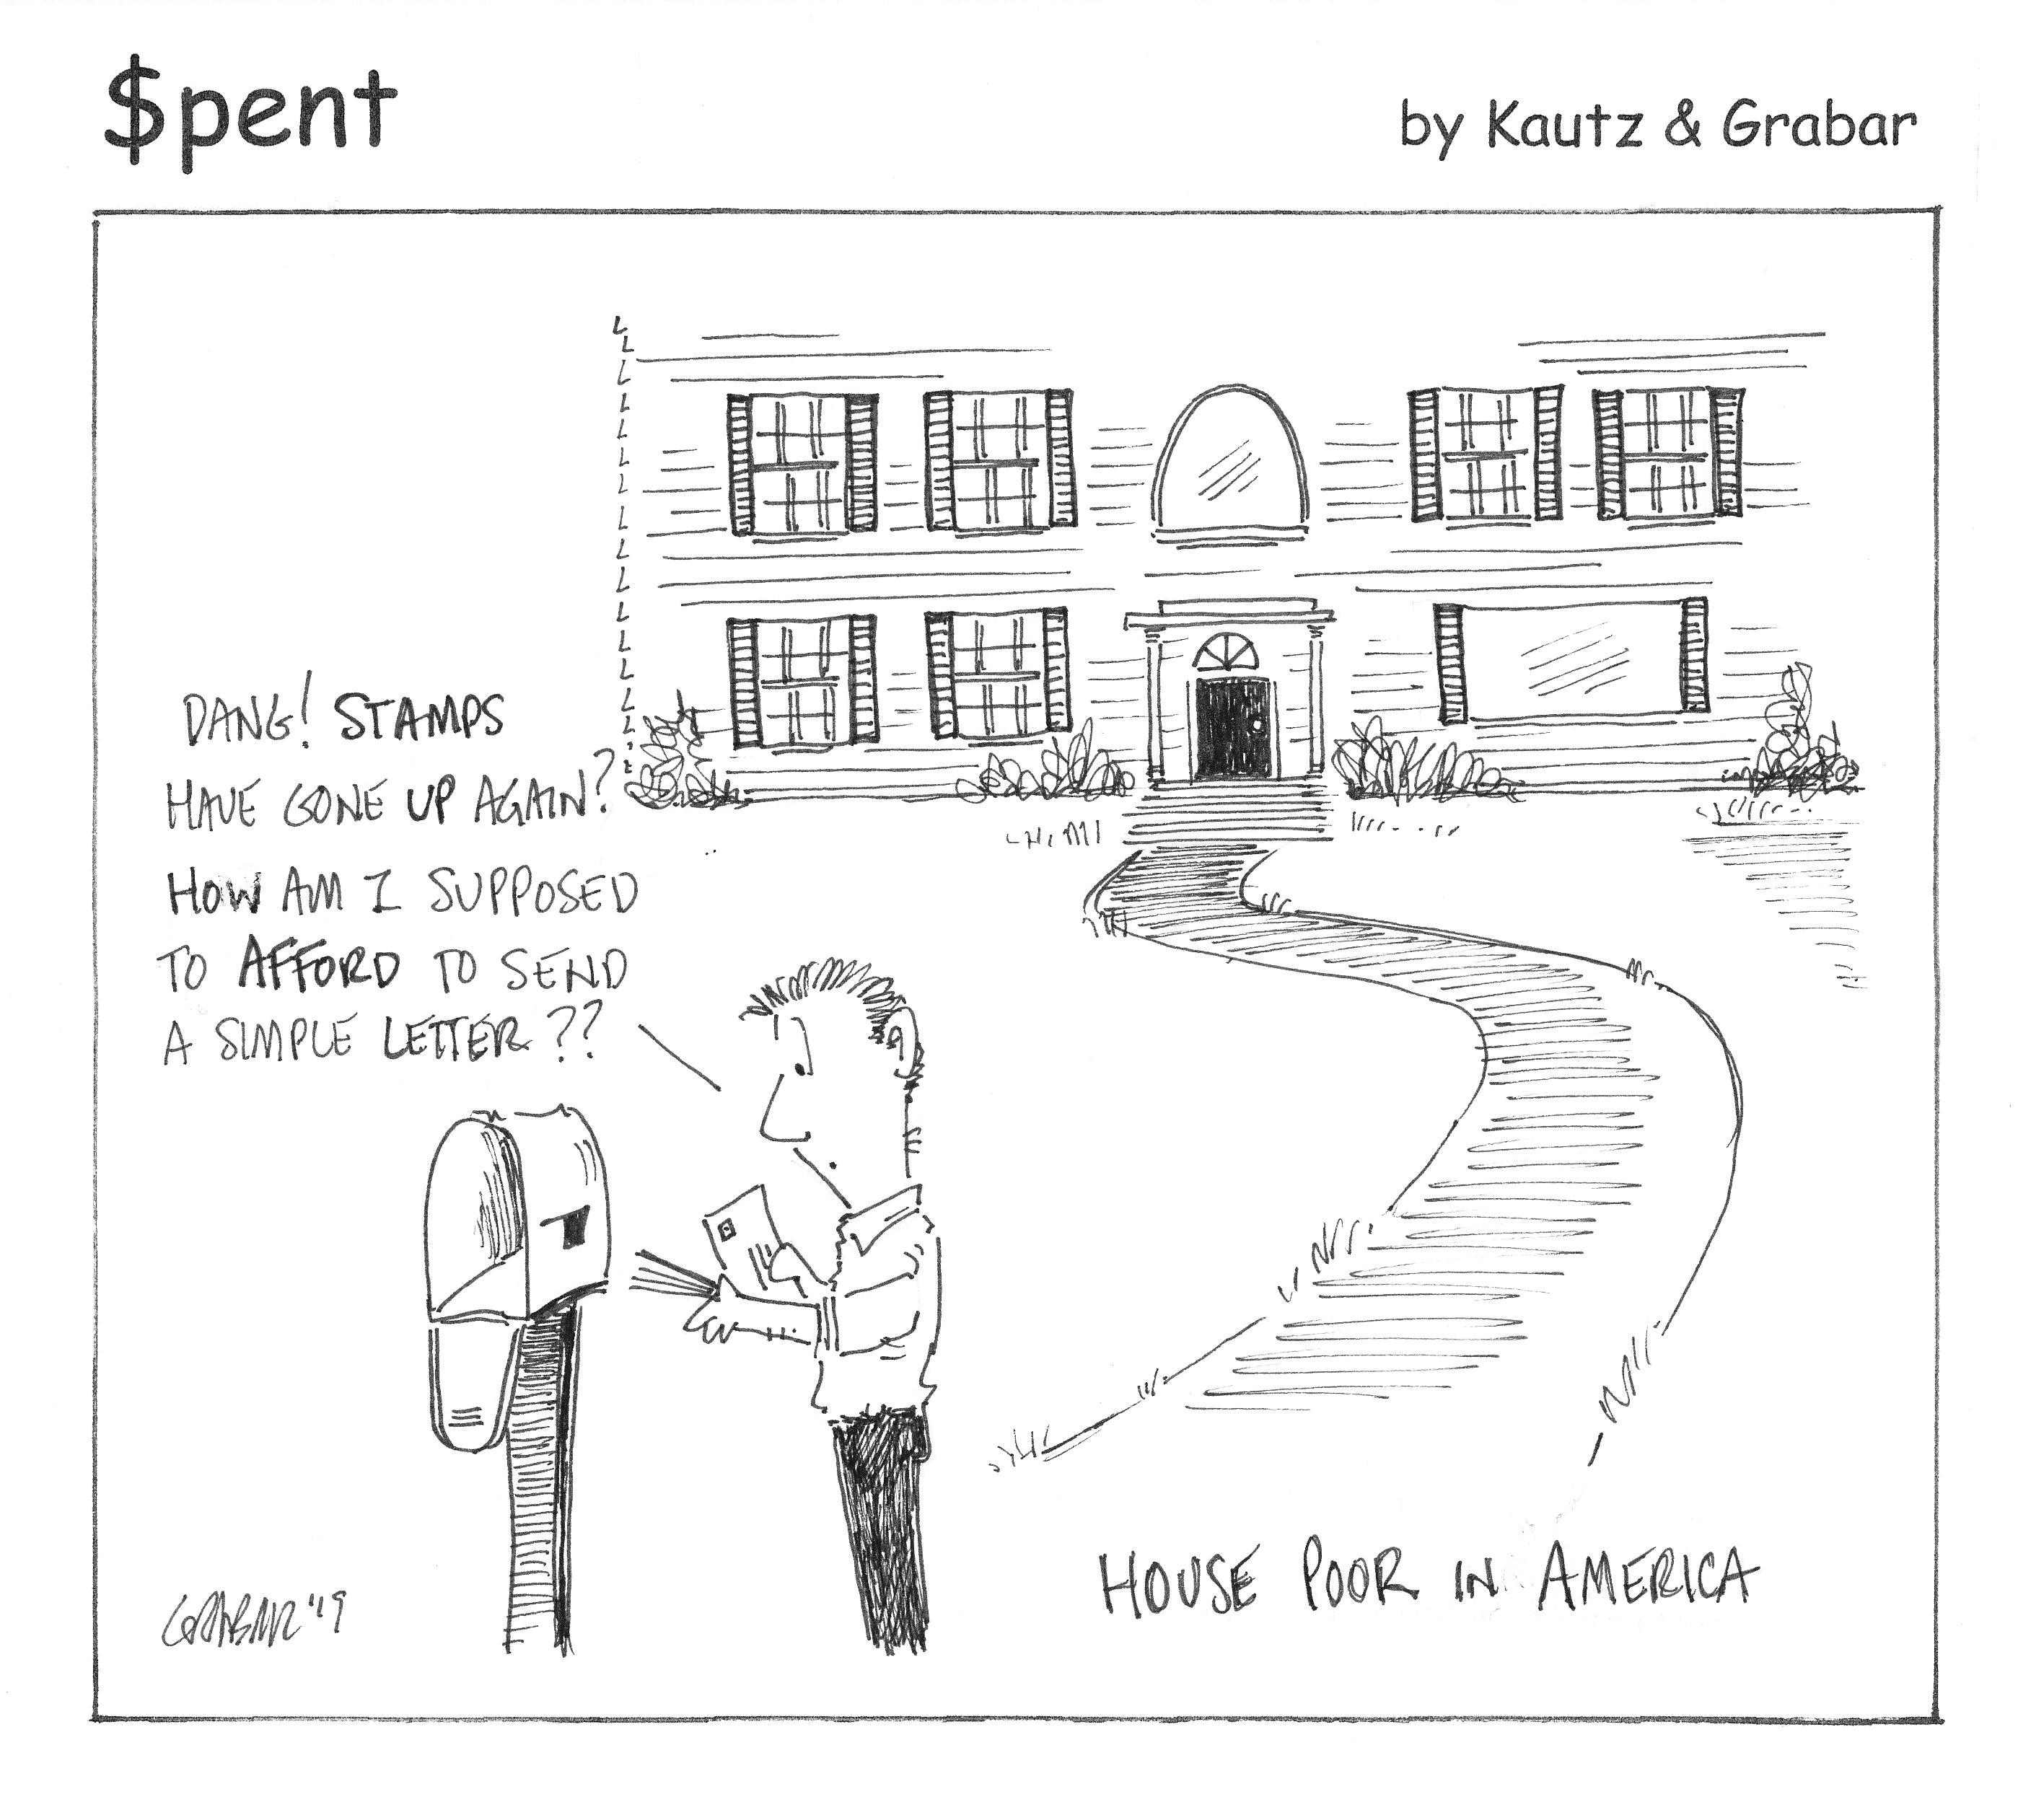 $pent Cartoon